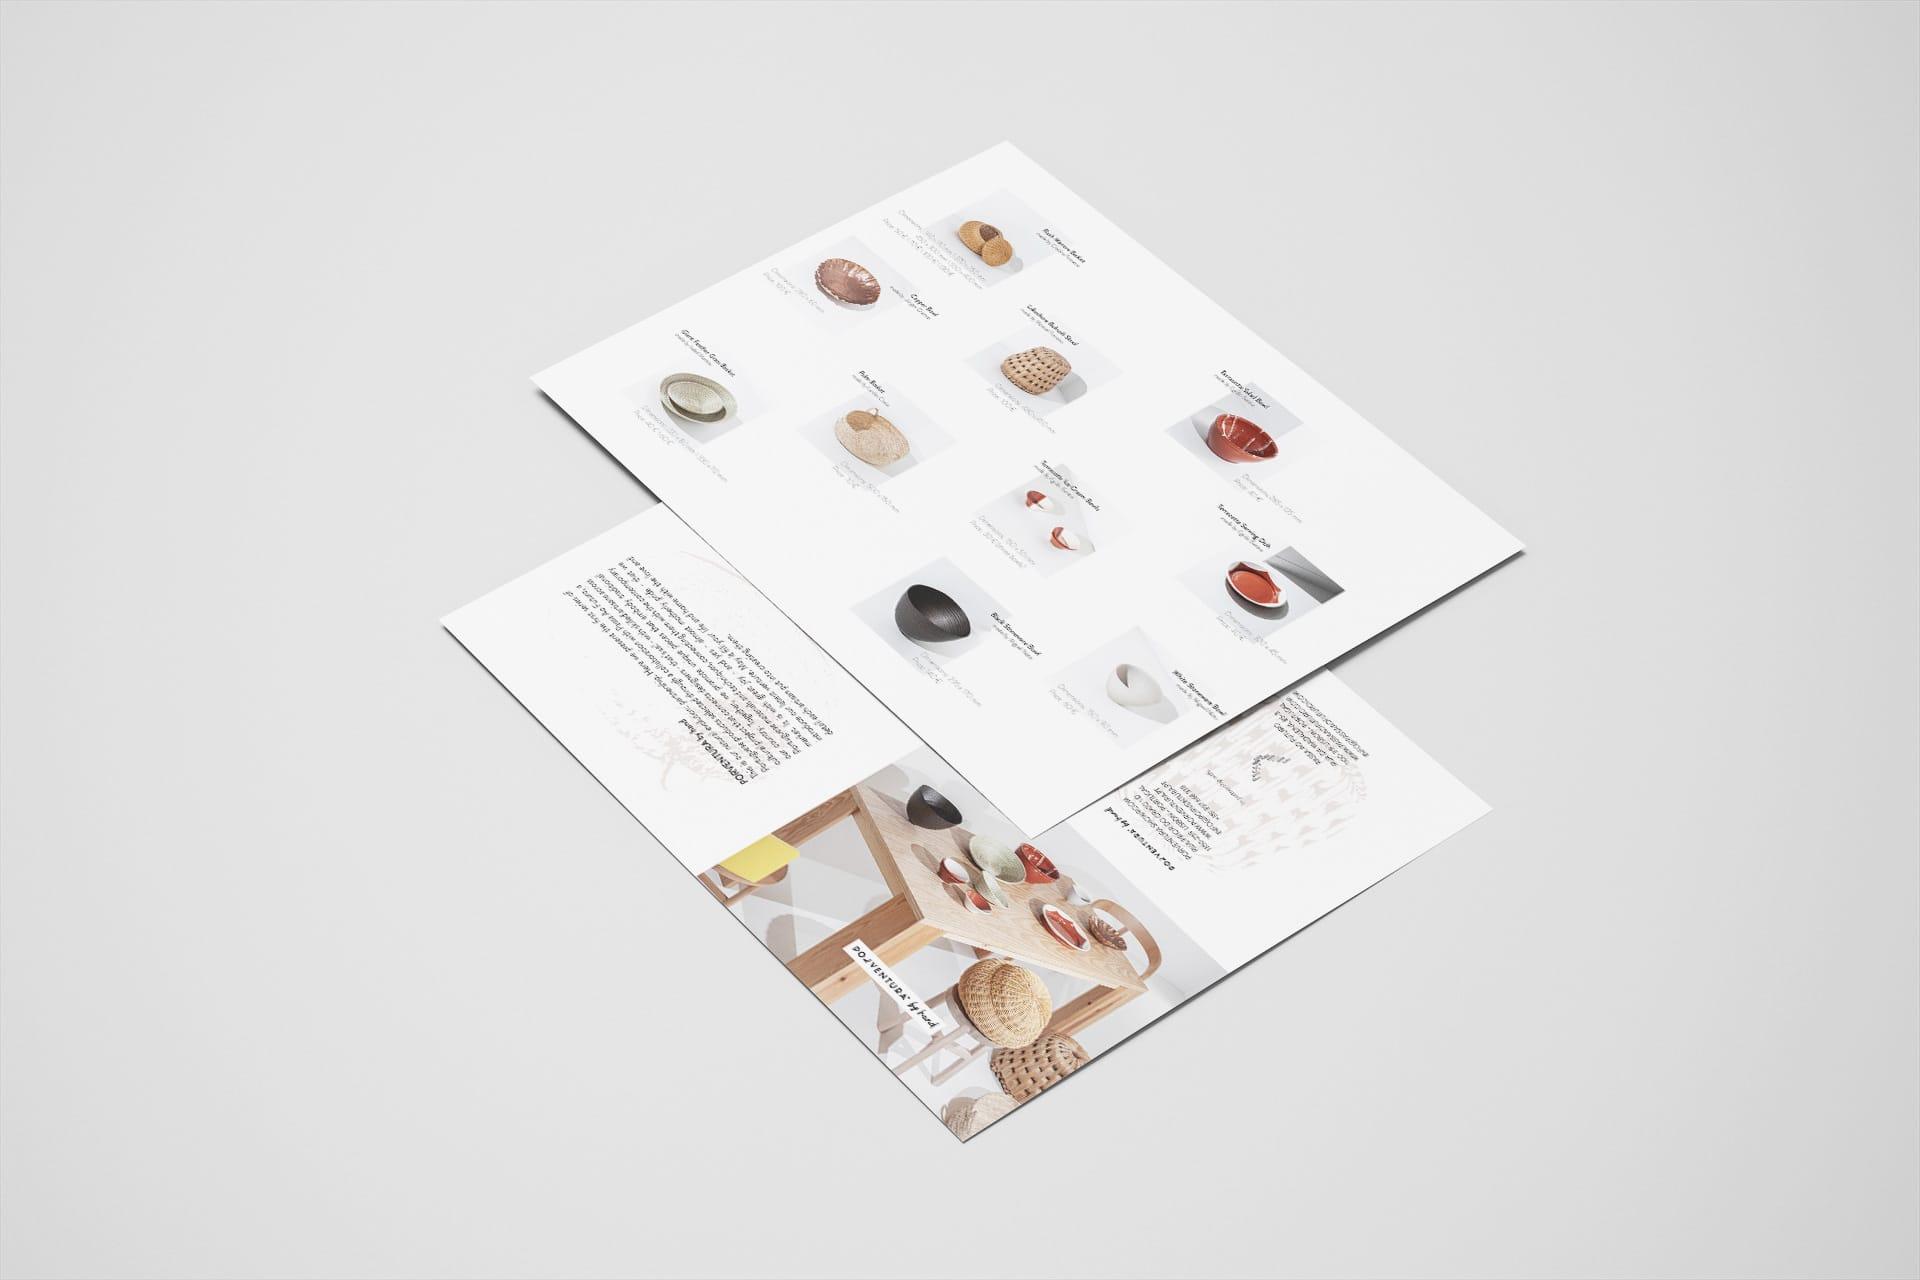 Brochura Porventurabyhand - DESIGN BY MIGUEL SOEIRO